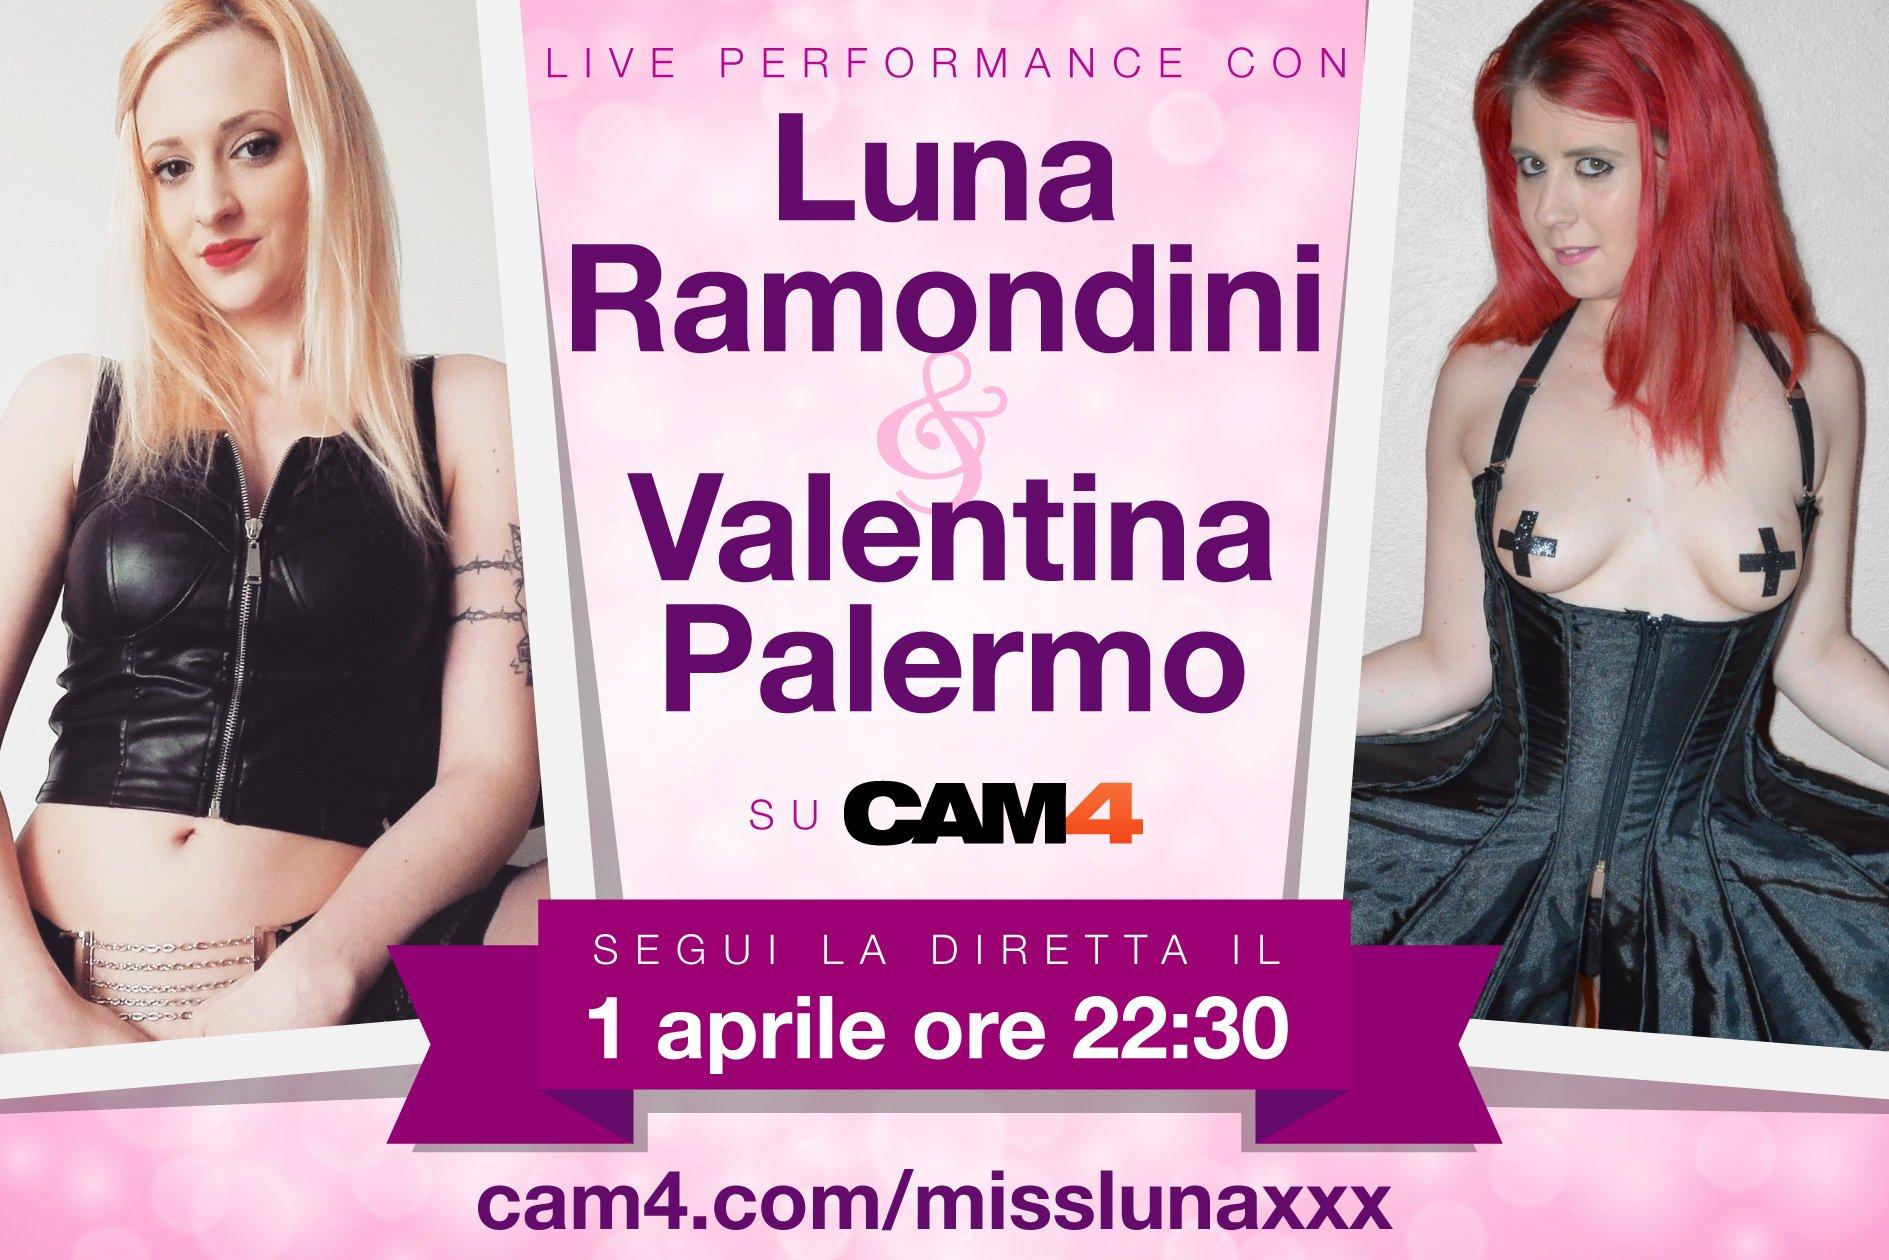 Luna Ramondini & Valentina Palermo Special Show – 1 Aprile in cam live su CAM4!